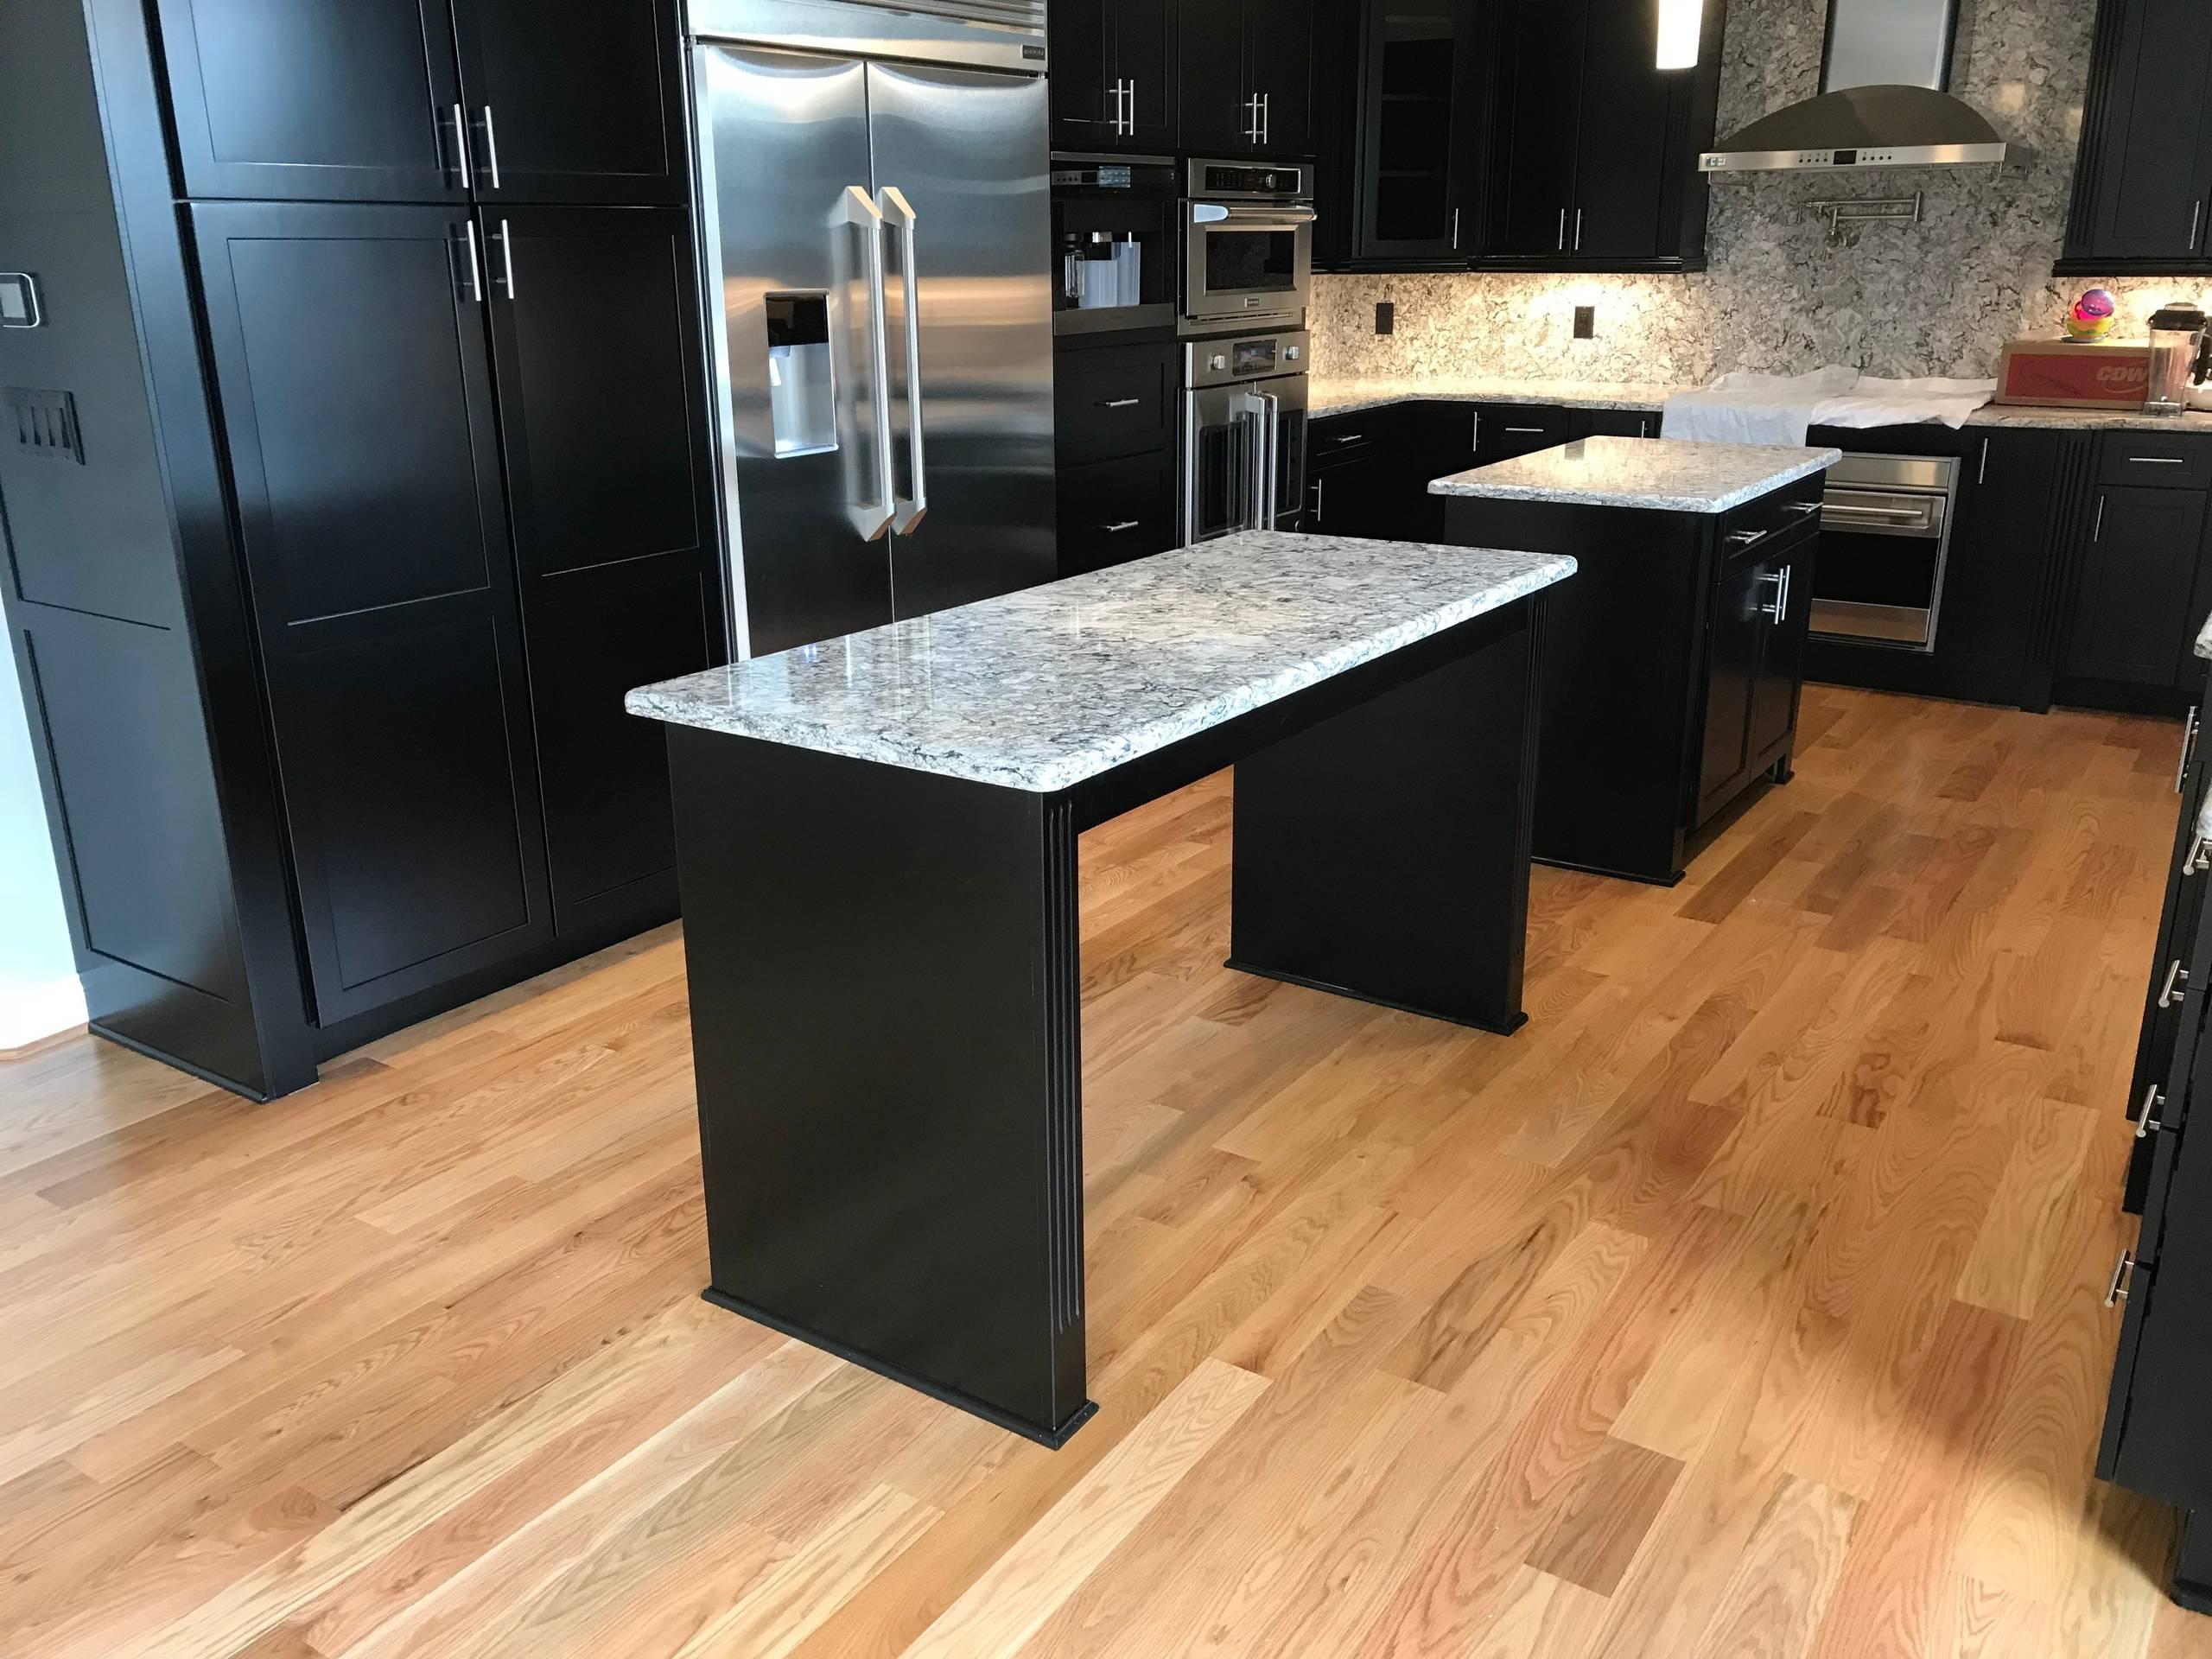 Riva Hardwood Flooring Repair and Finishing